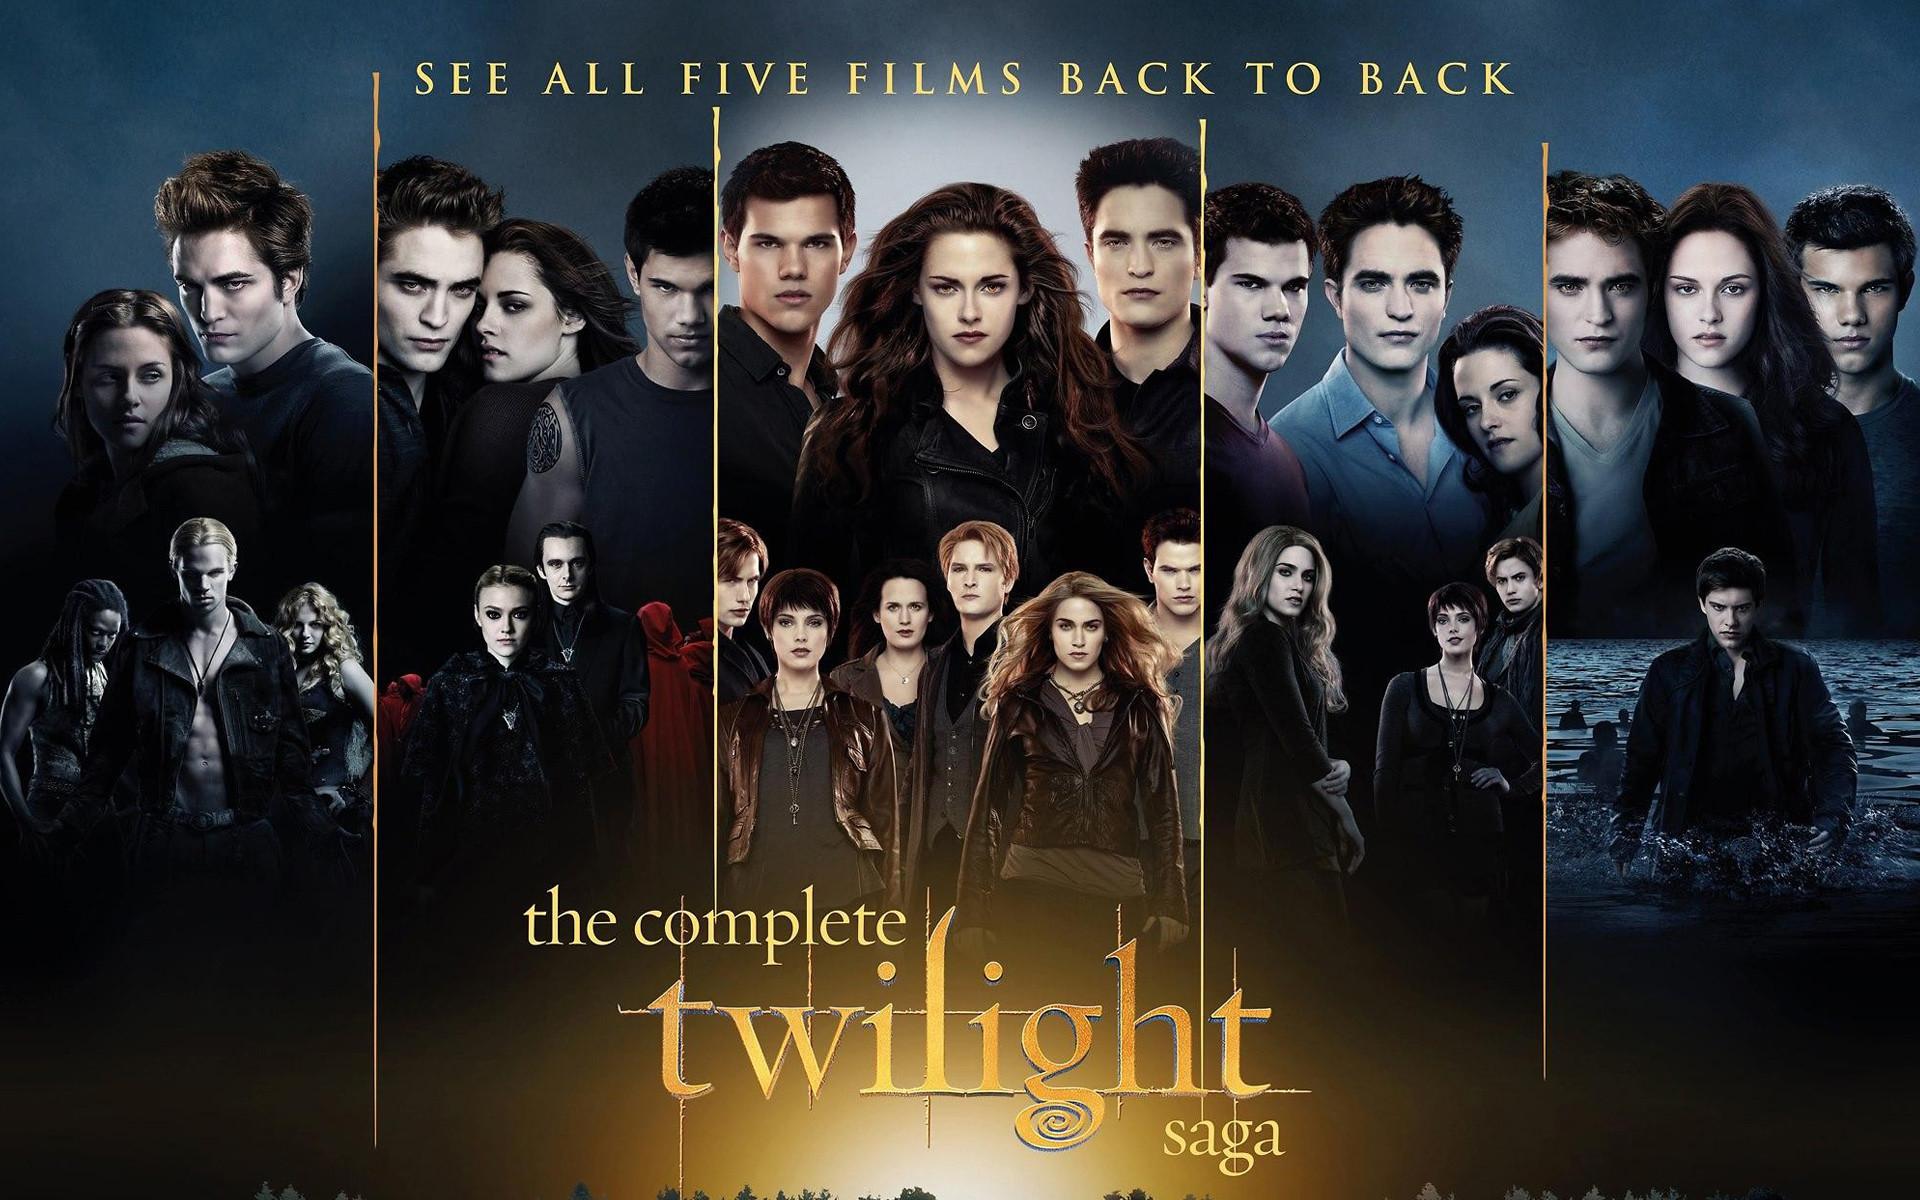 Twilight Saga Wallpapers 70 images 1920x1200